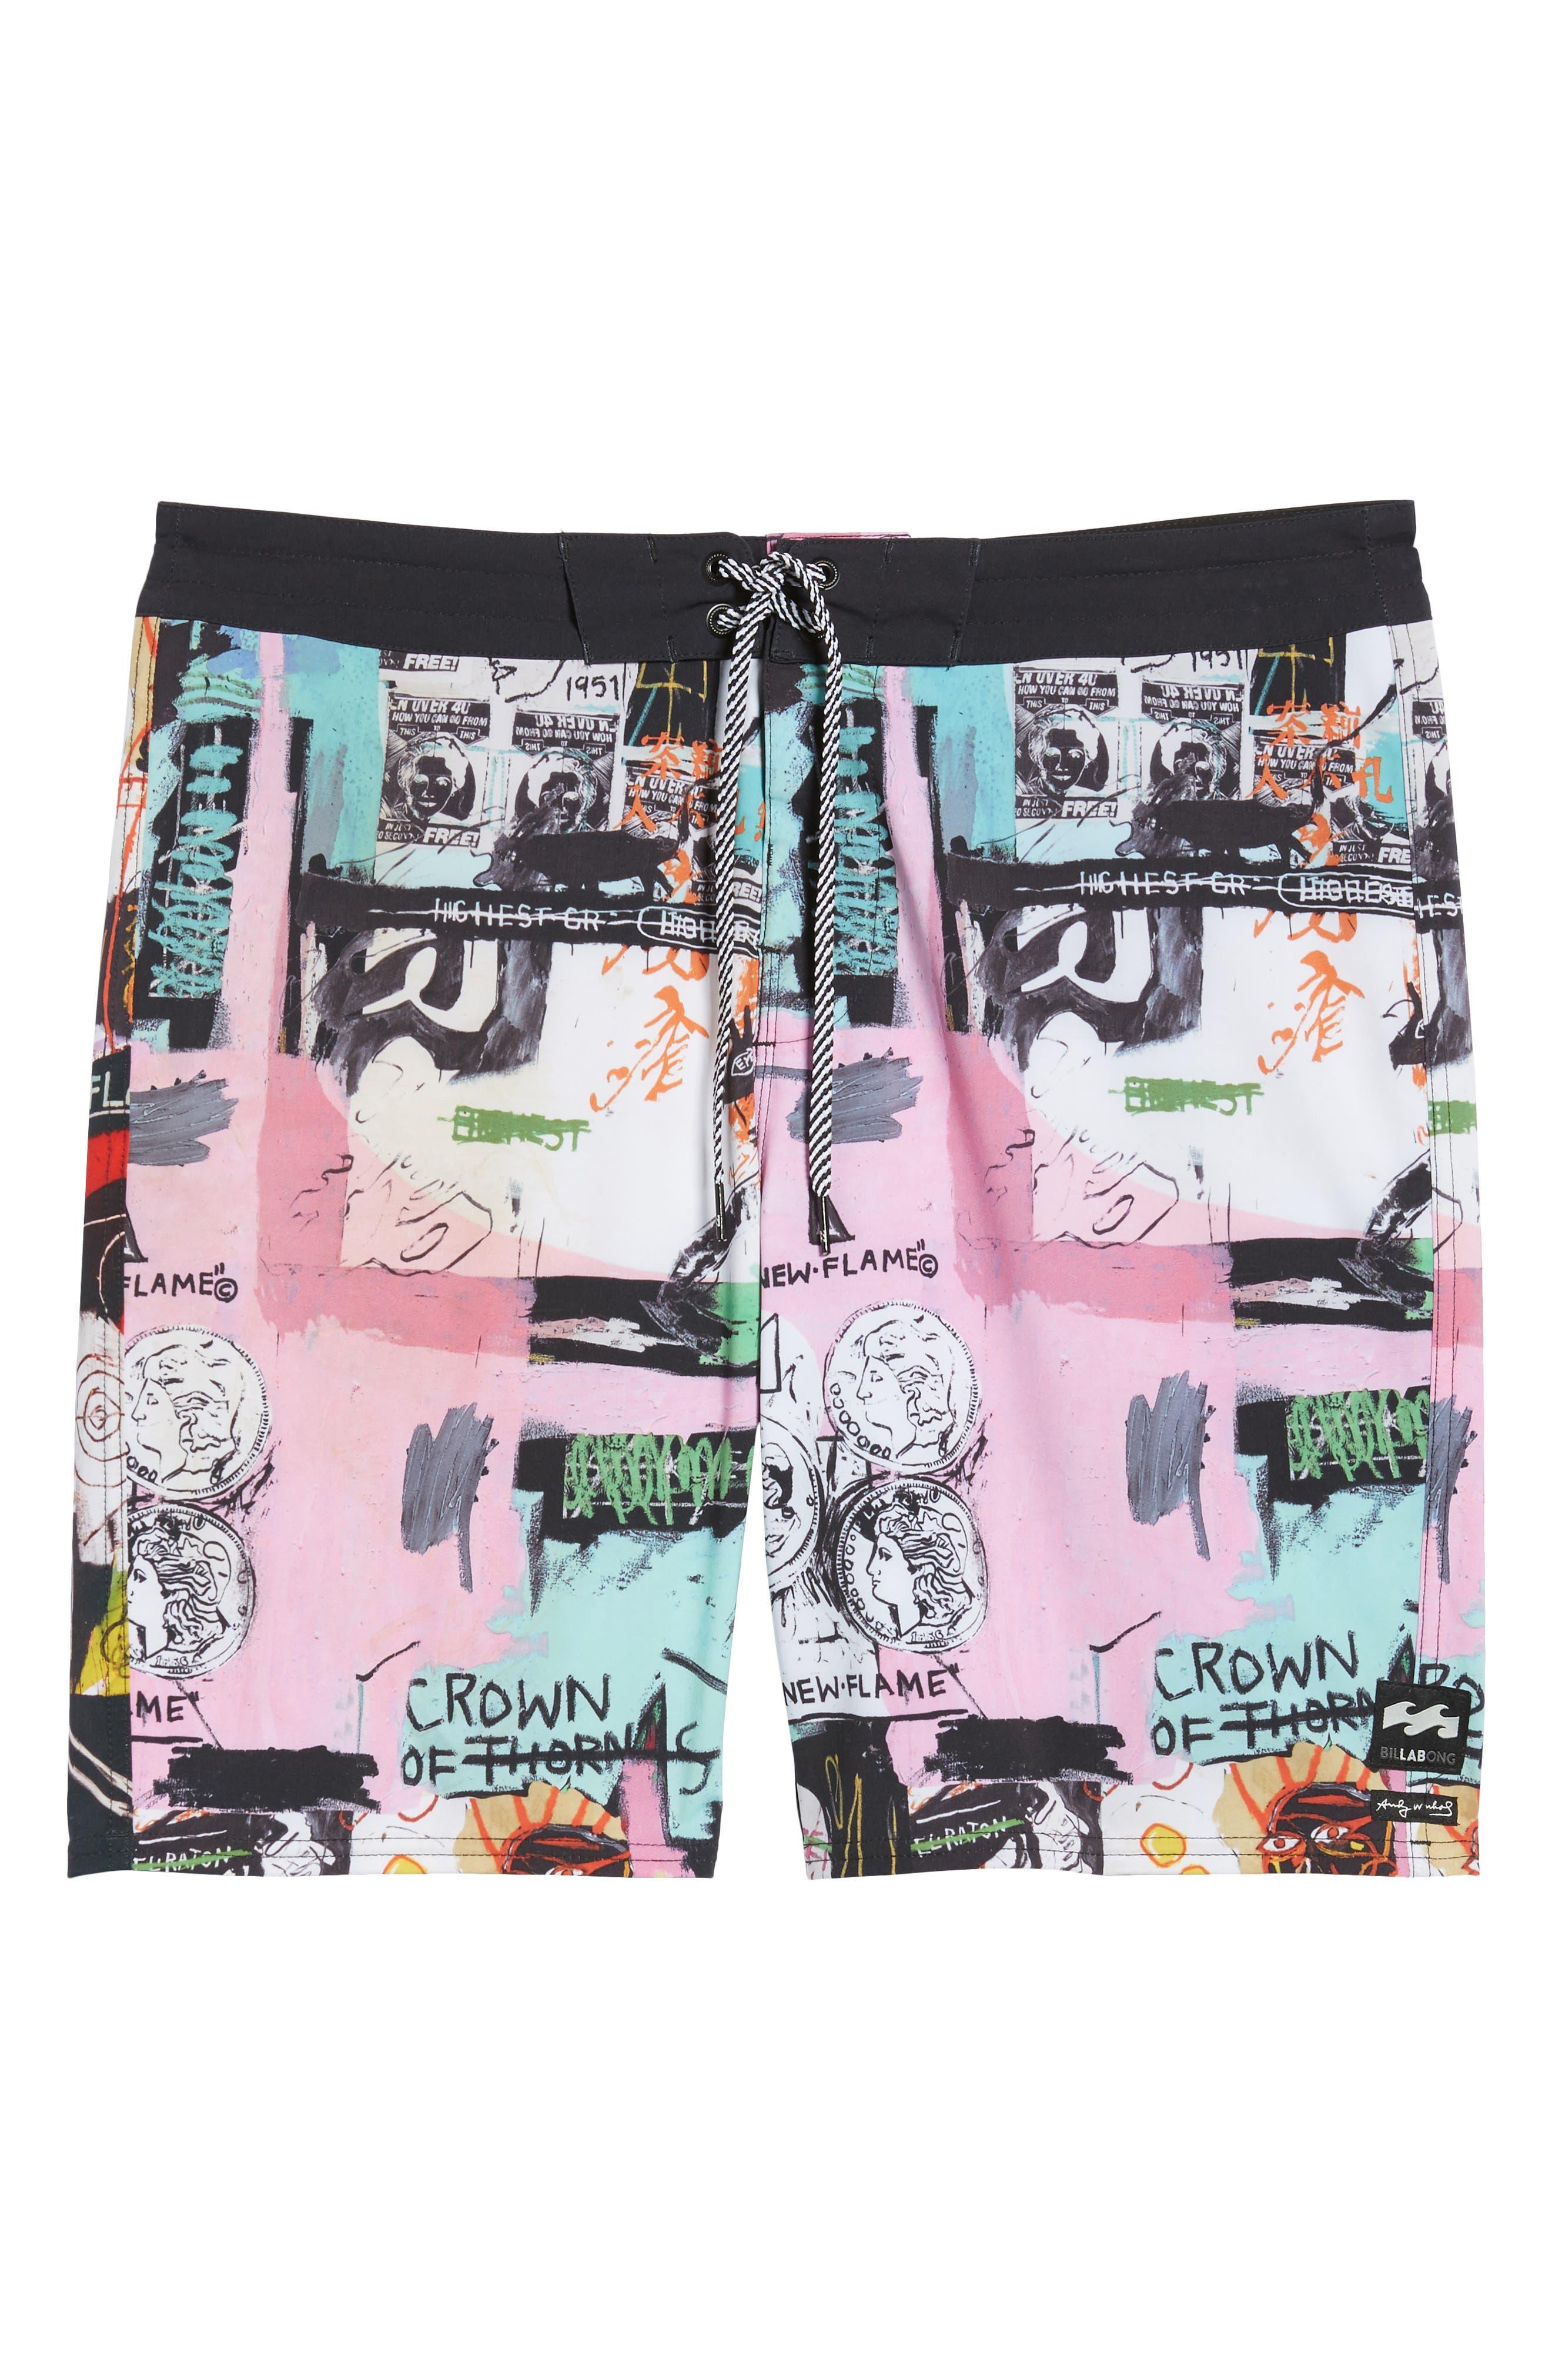 x Warhol Factory X Board Shorts,                             Alternate thumbnail 6, color,                             Multi